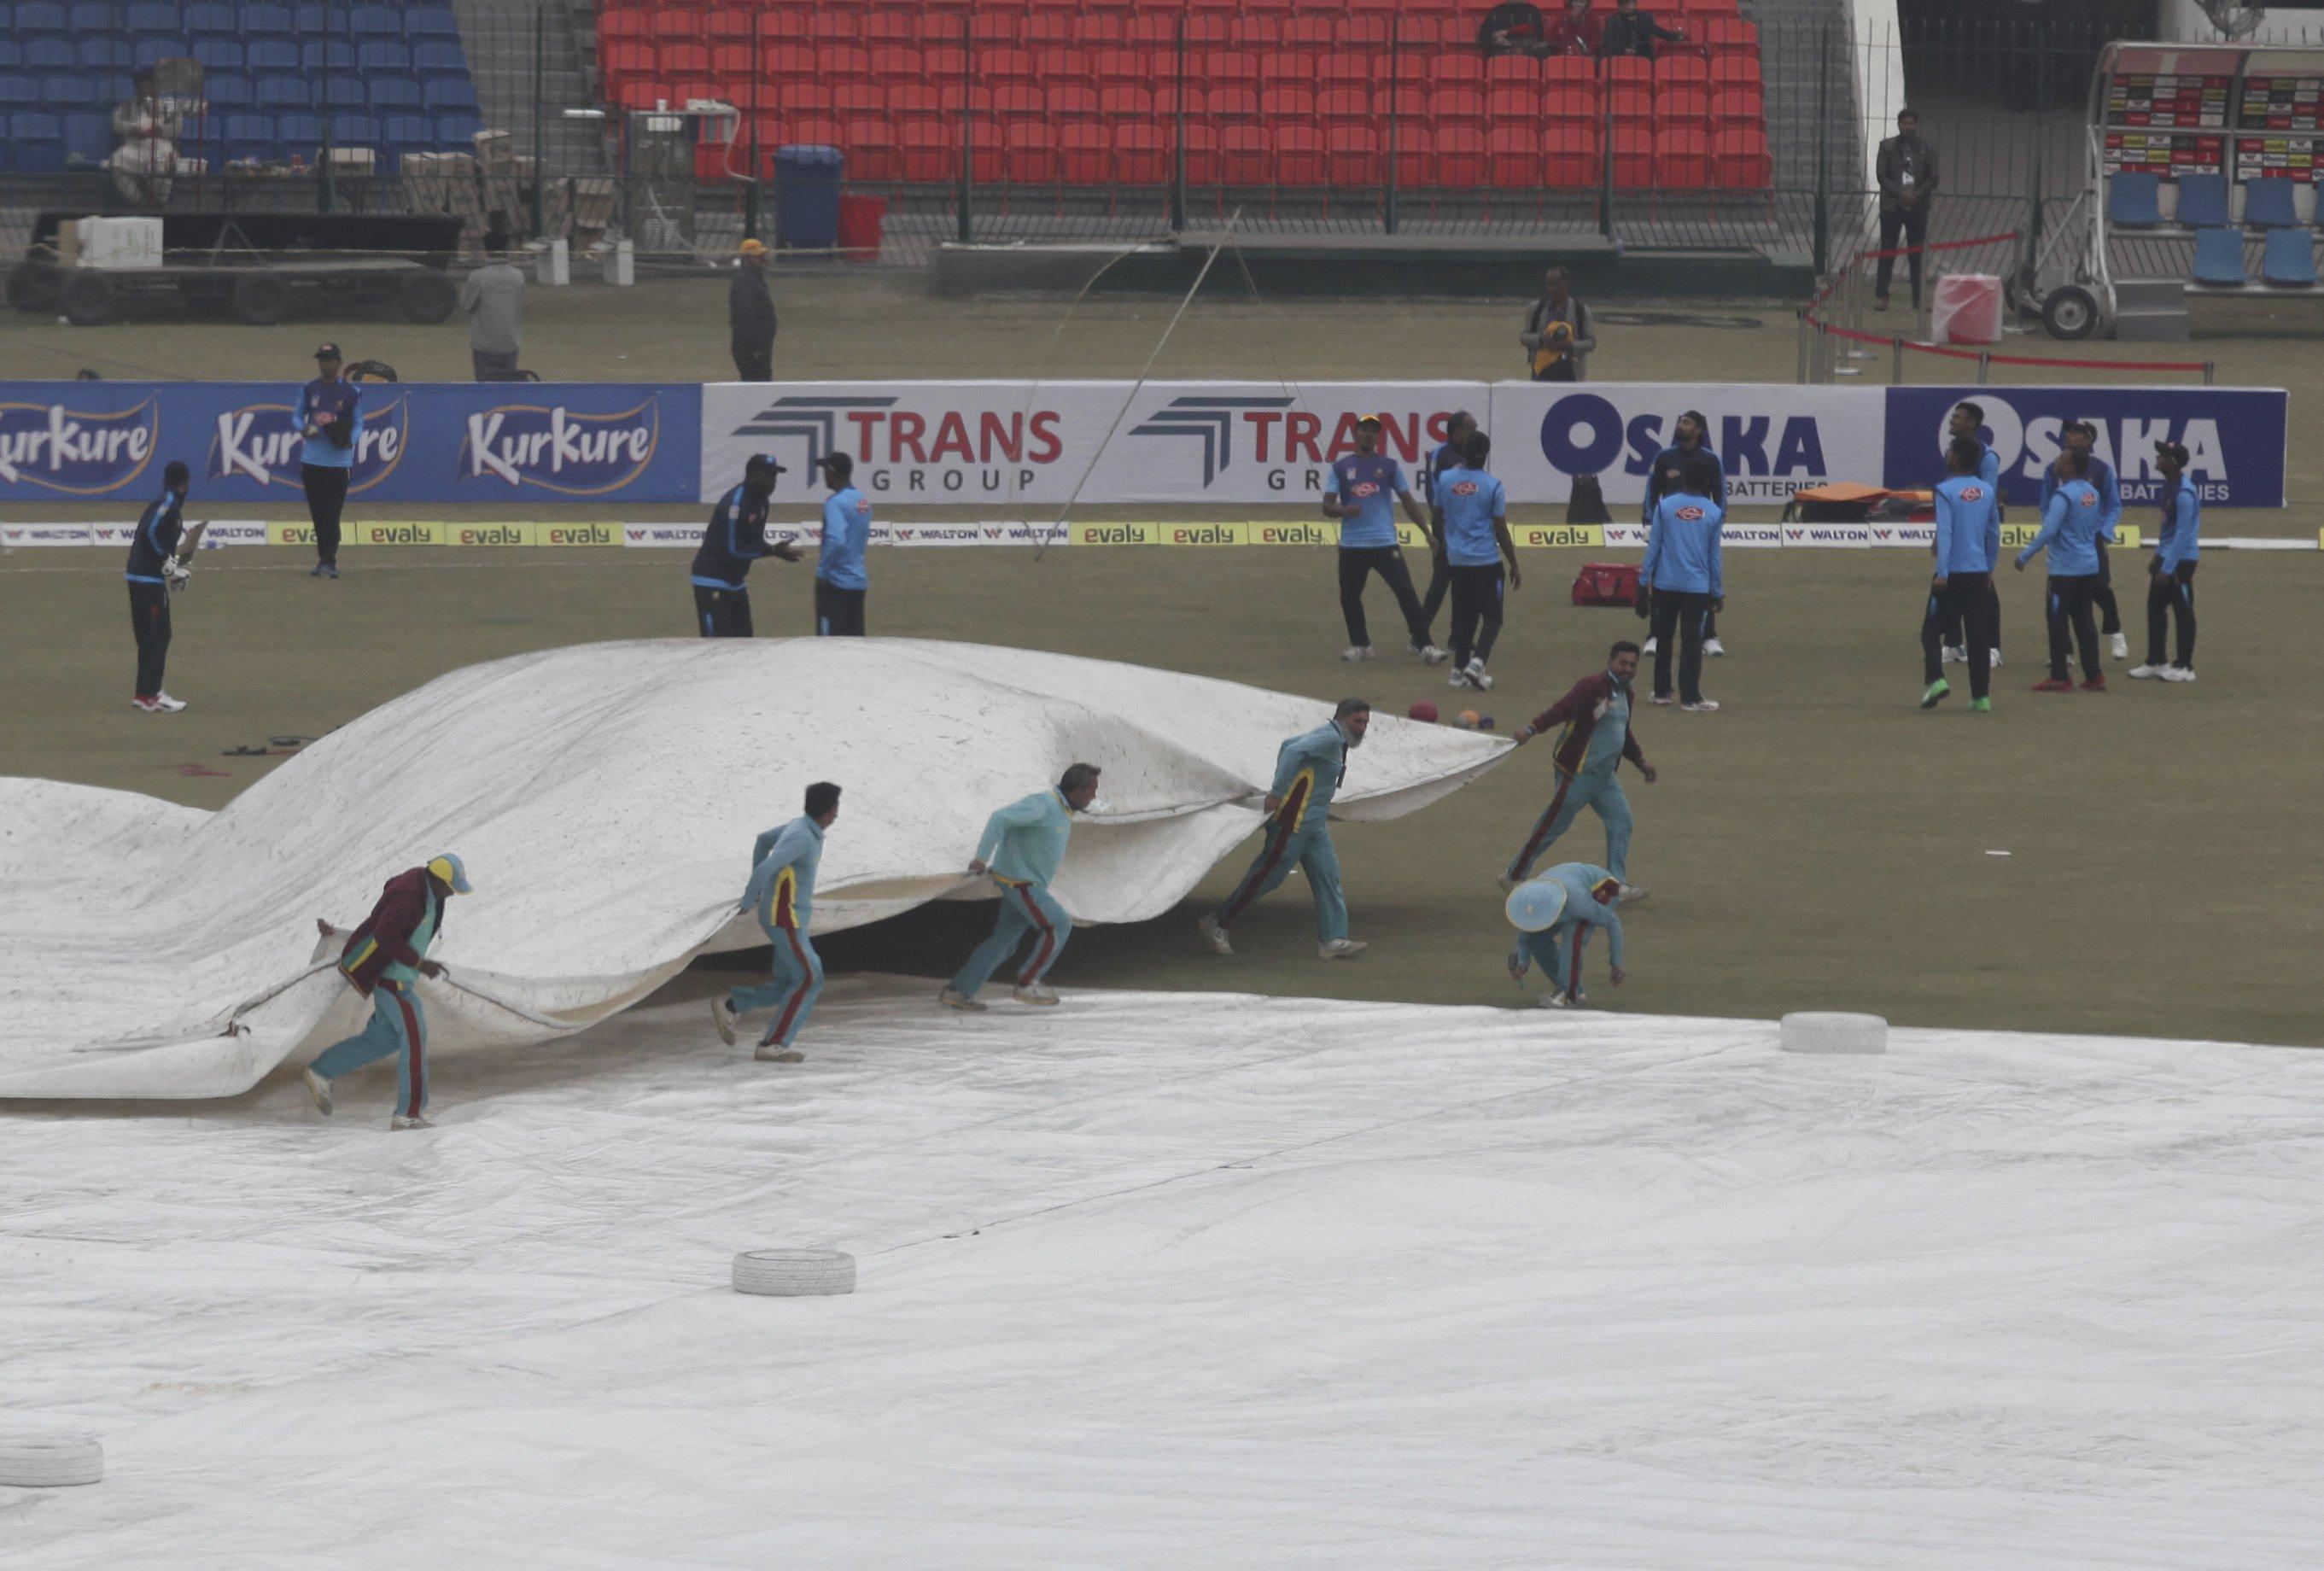 Pakistan retains top T20 ranking after washout vs Bangladesh